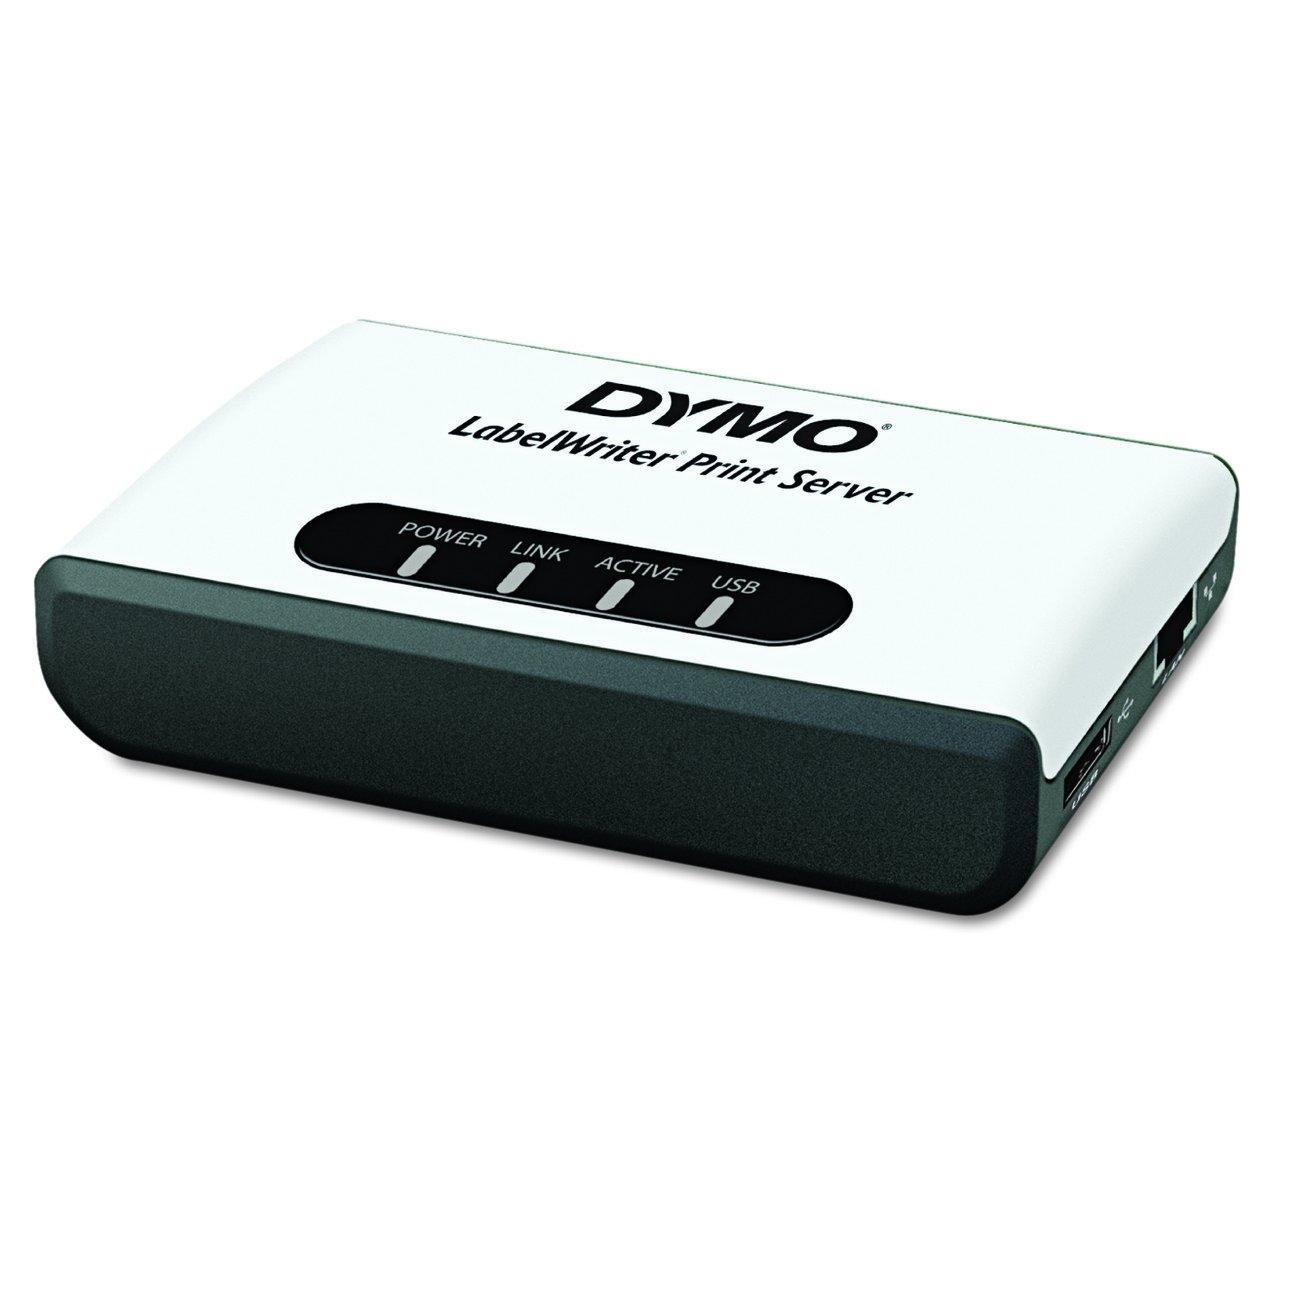 DYMO LabelWriter Print Server by DYMO